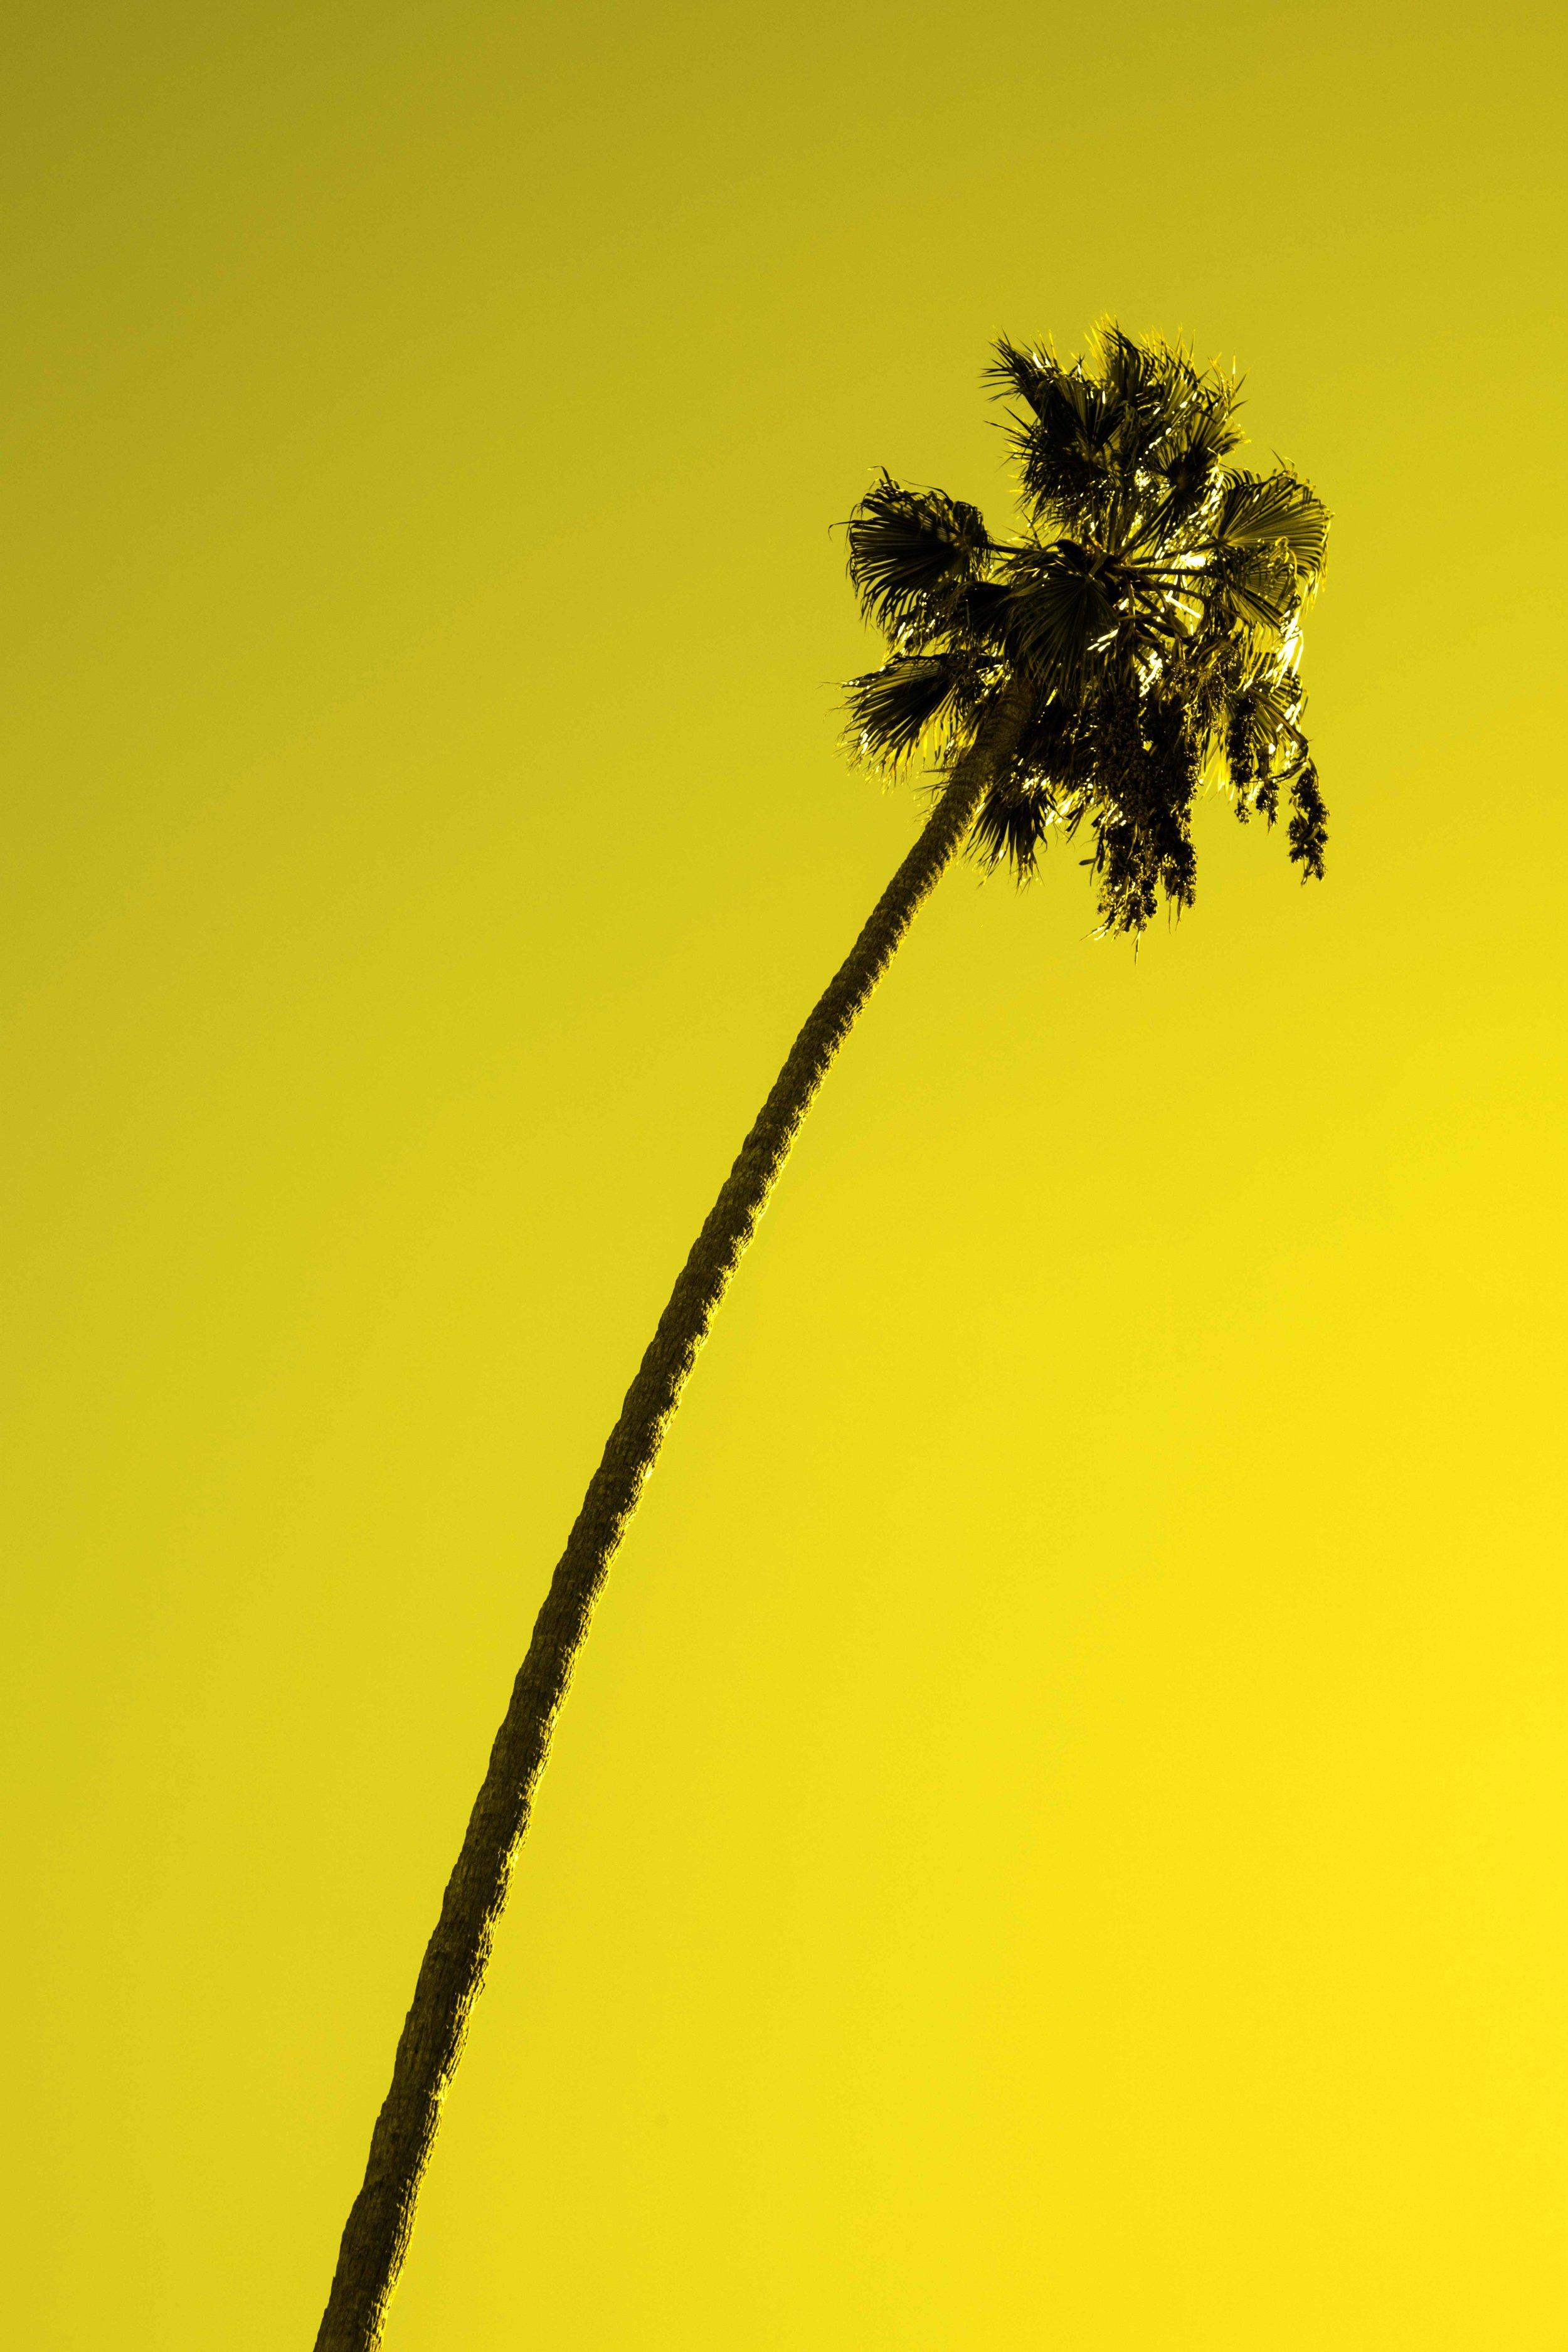 PALM_TREES-5846_V2.jpg